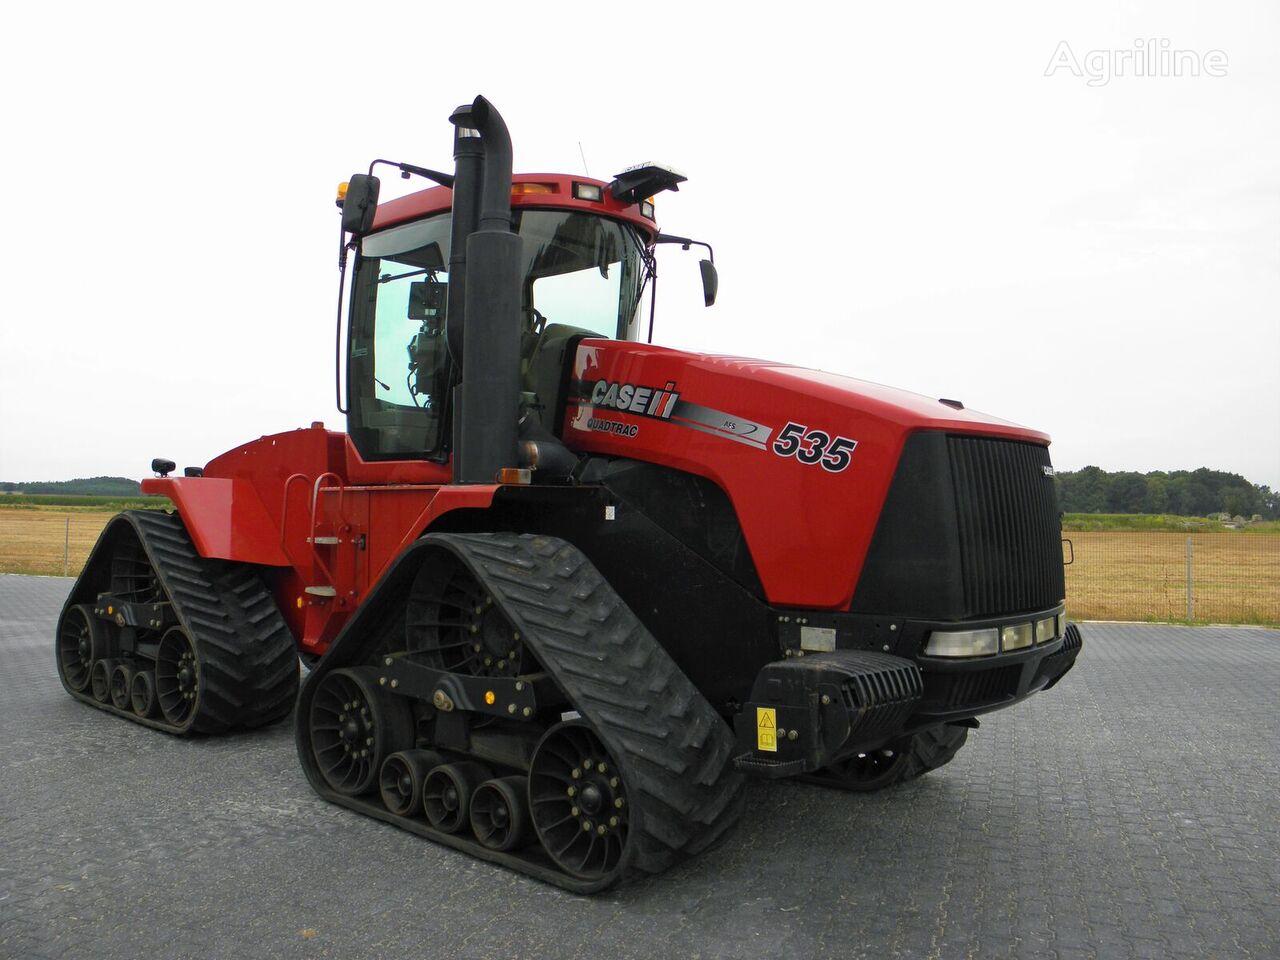 CASE IH Quadtrac 535 tractor de cadenas